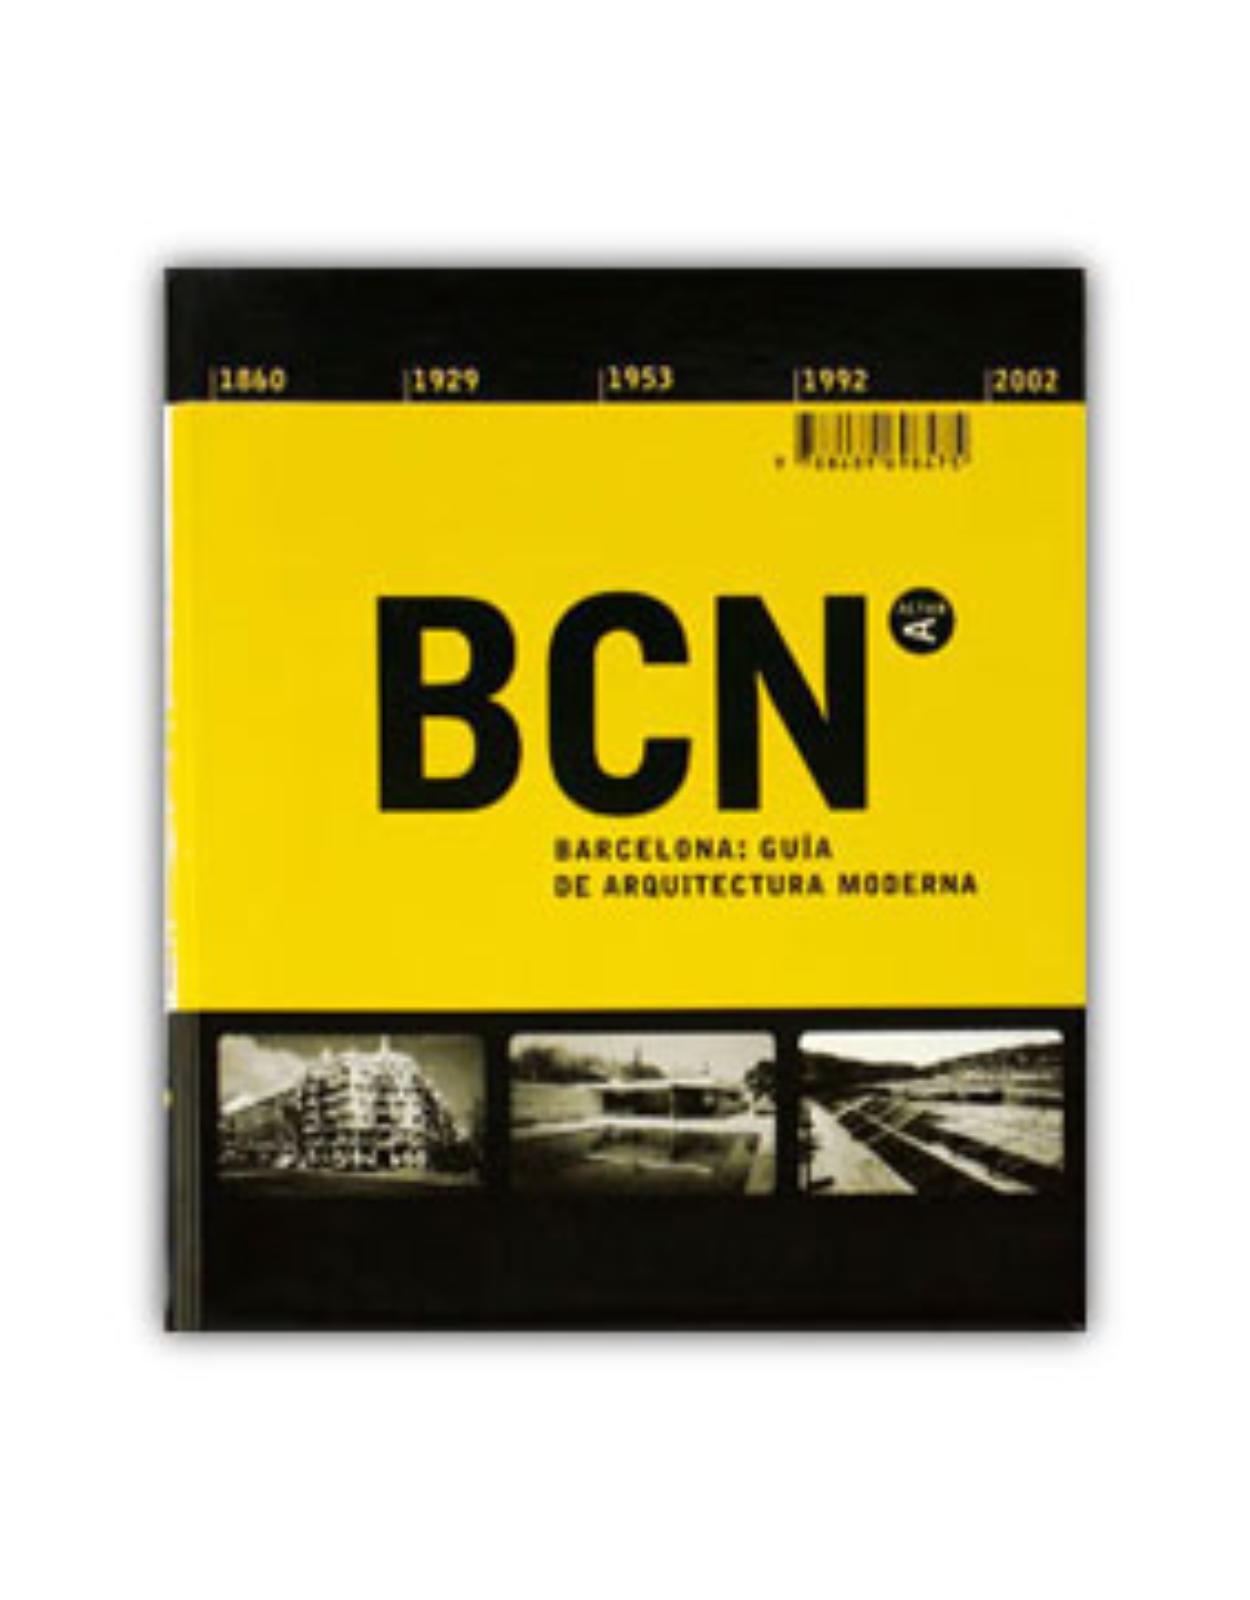 Architecture Guide to Barcelona 1860-2002